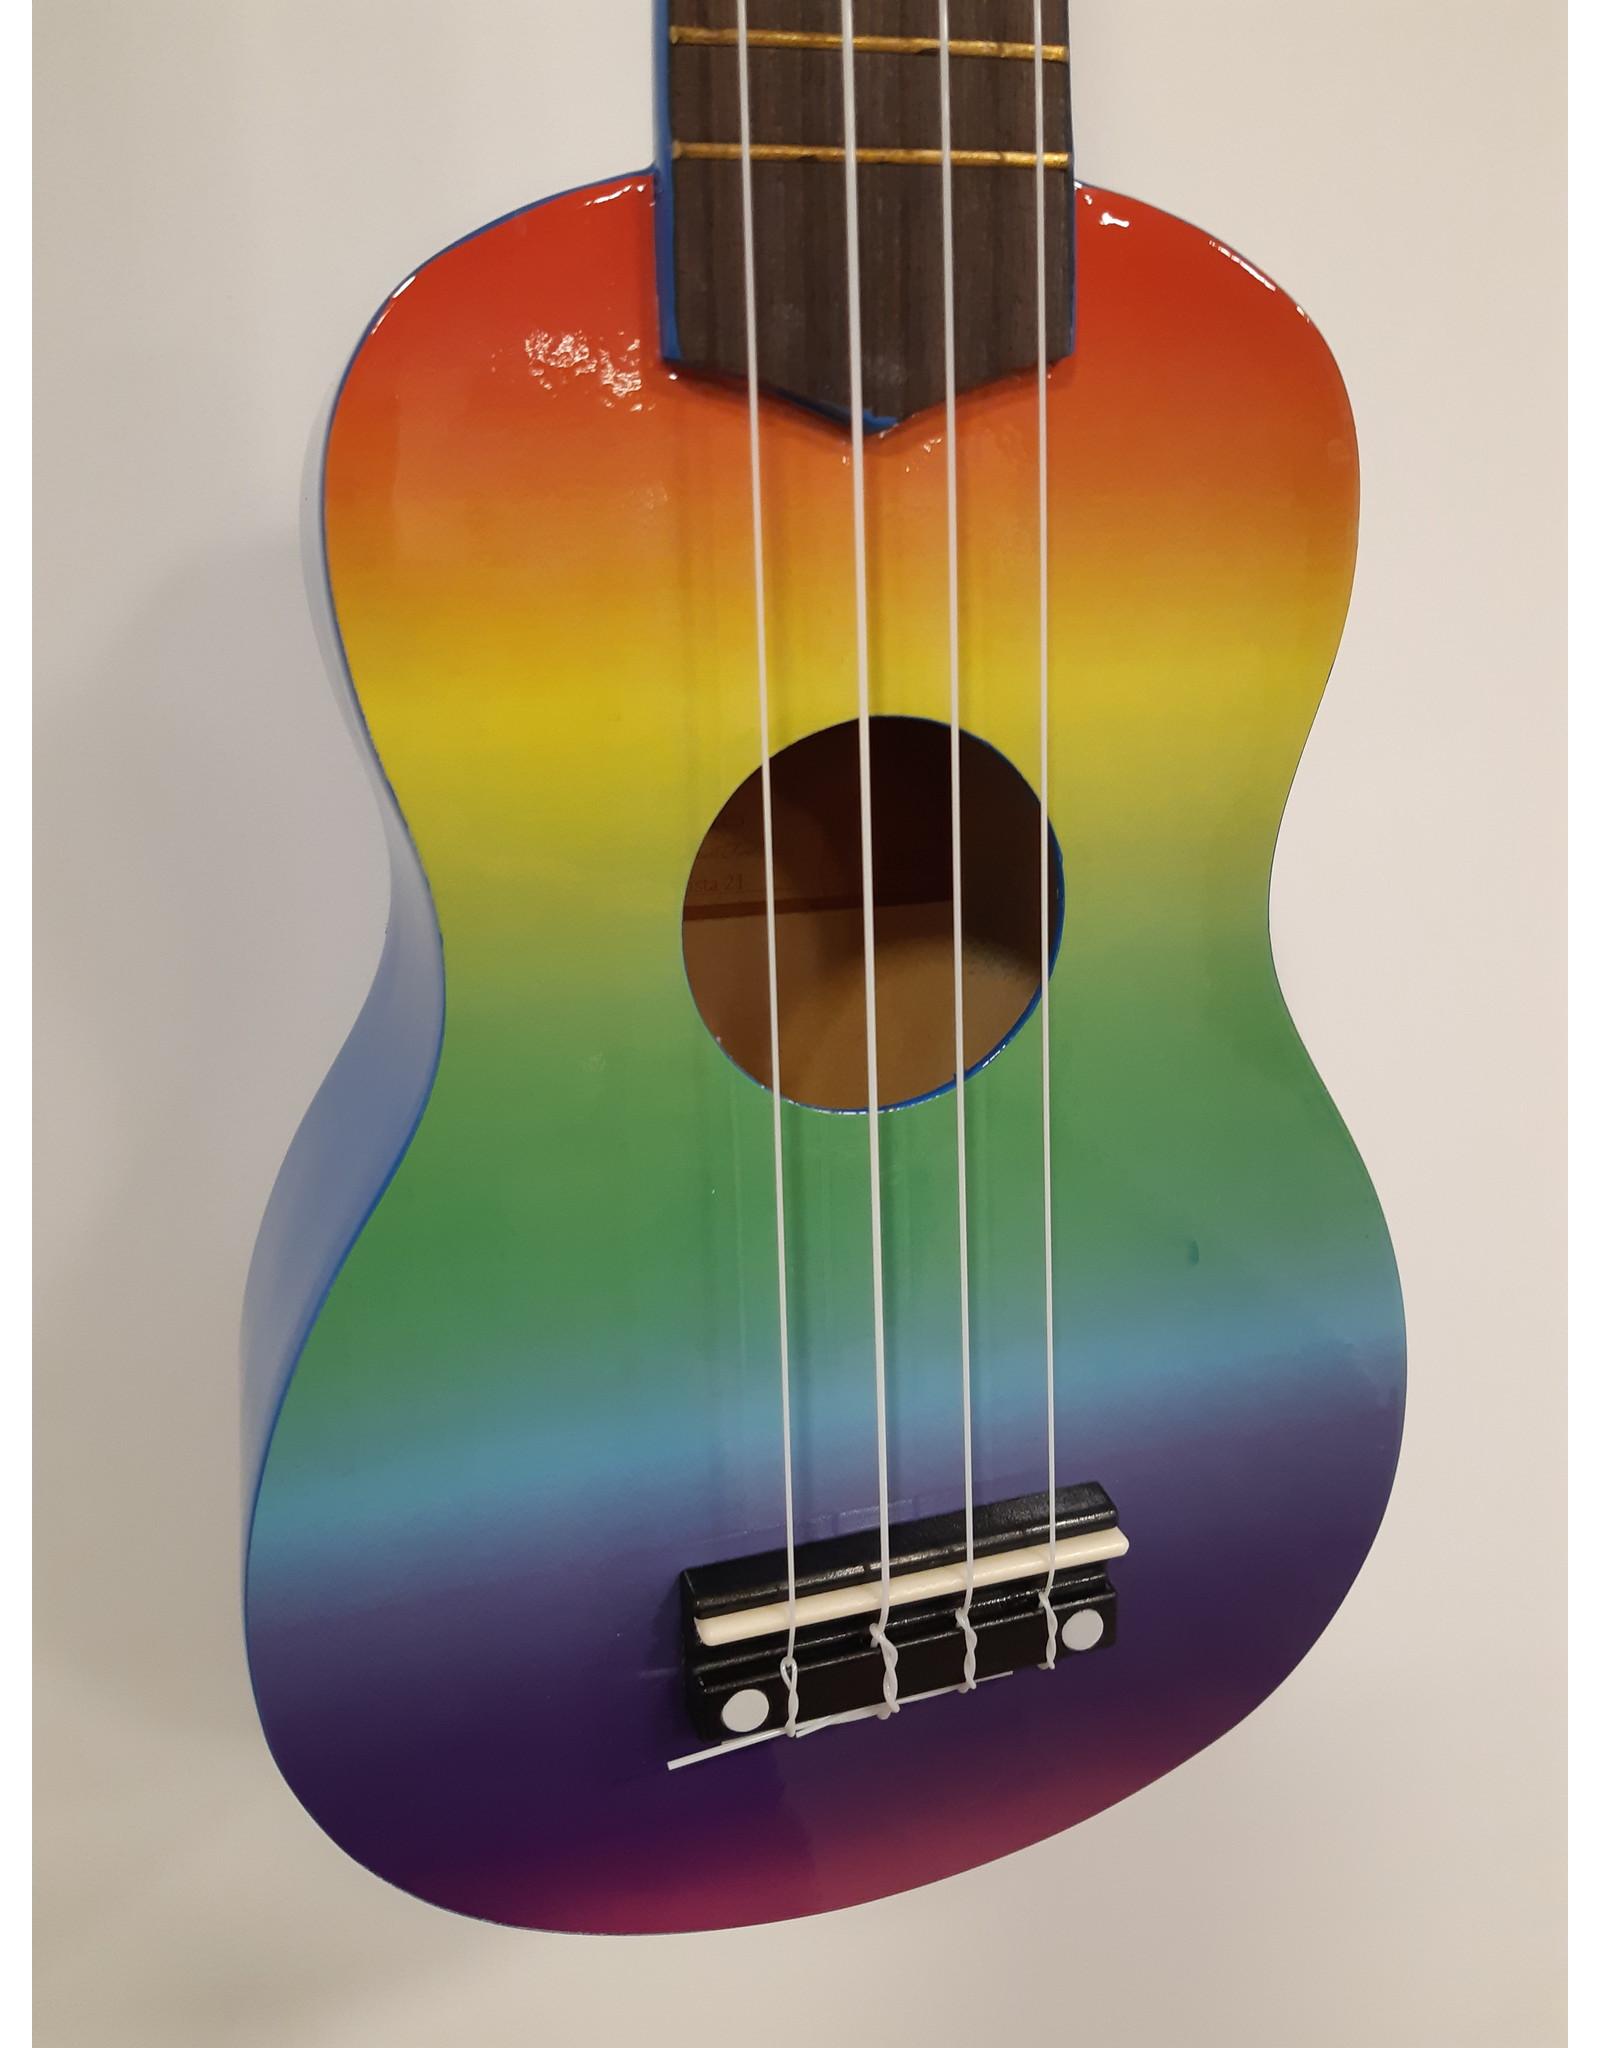 CLX Clx Sopraan Ukulele calista 21 rainbow air